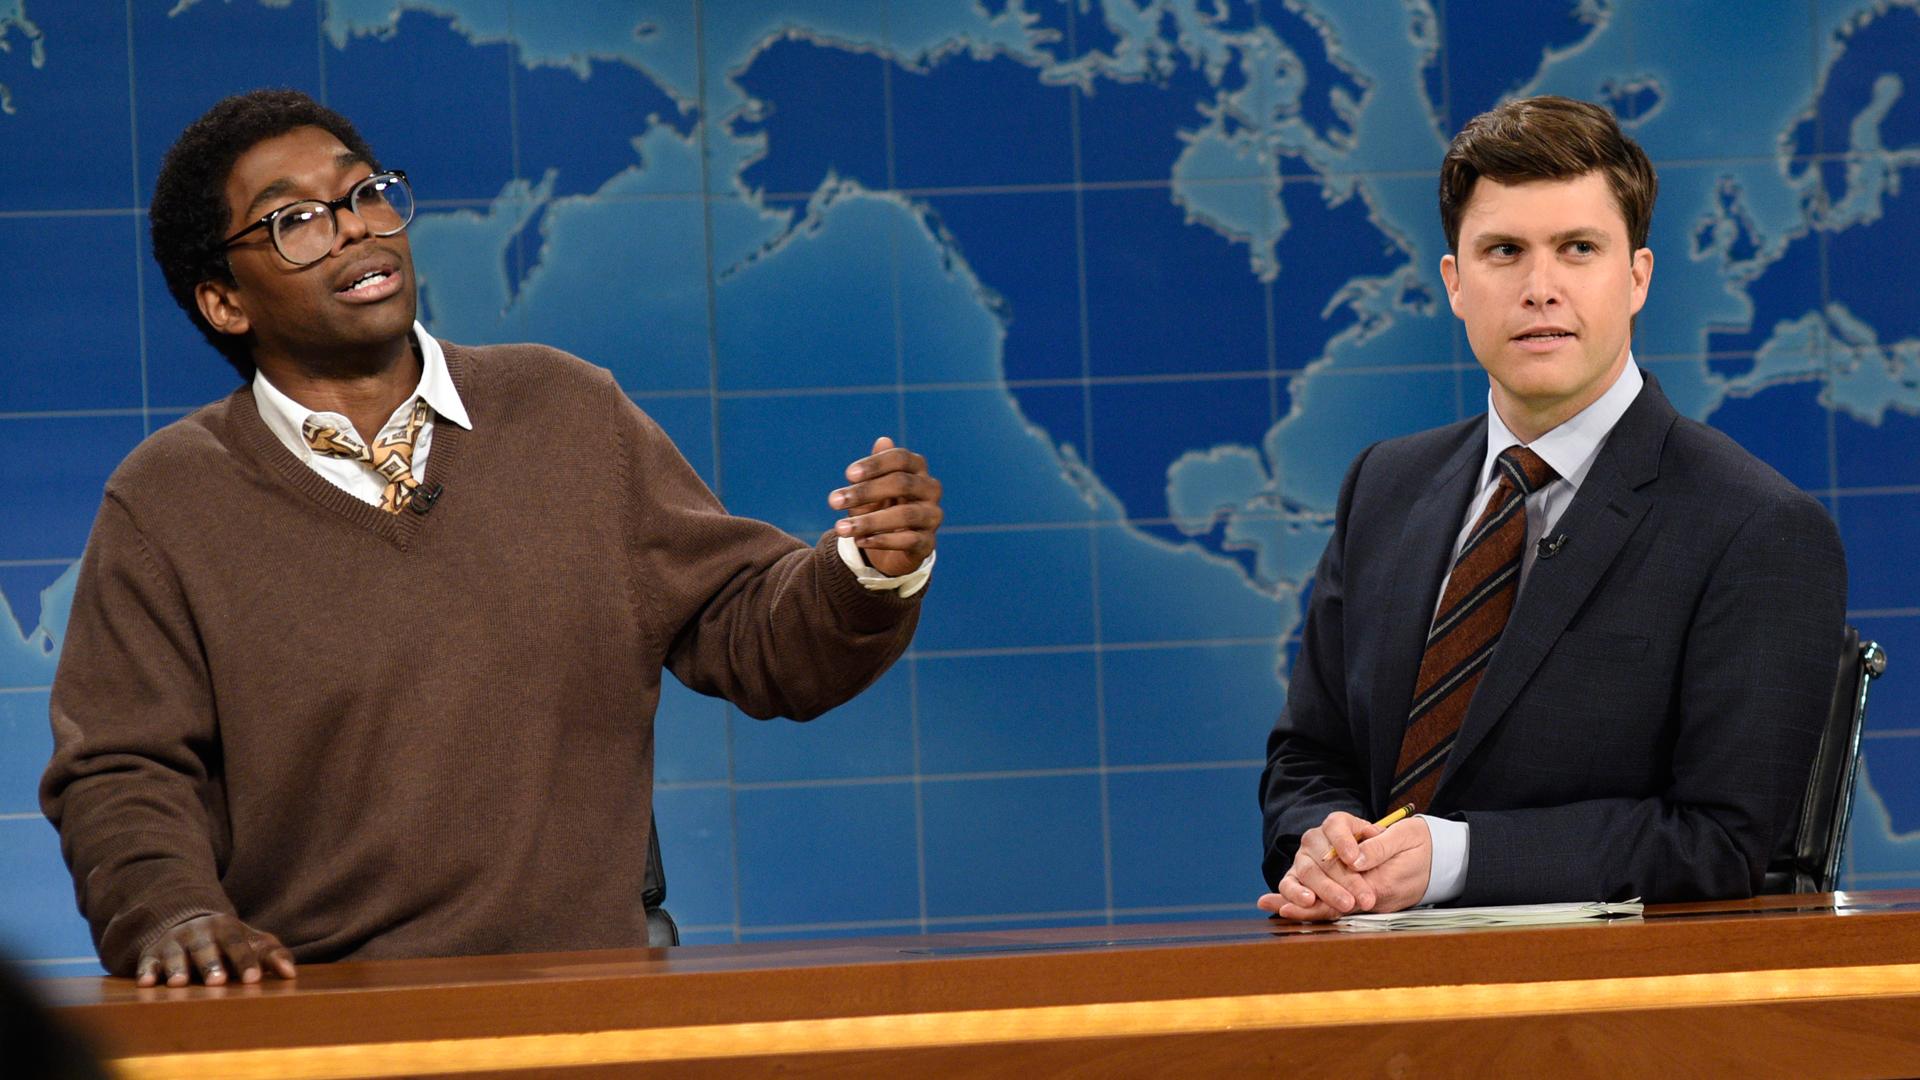 Watch Weekend Update: Solomon From Saturday Night Live ...